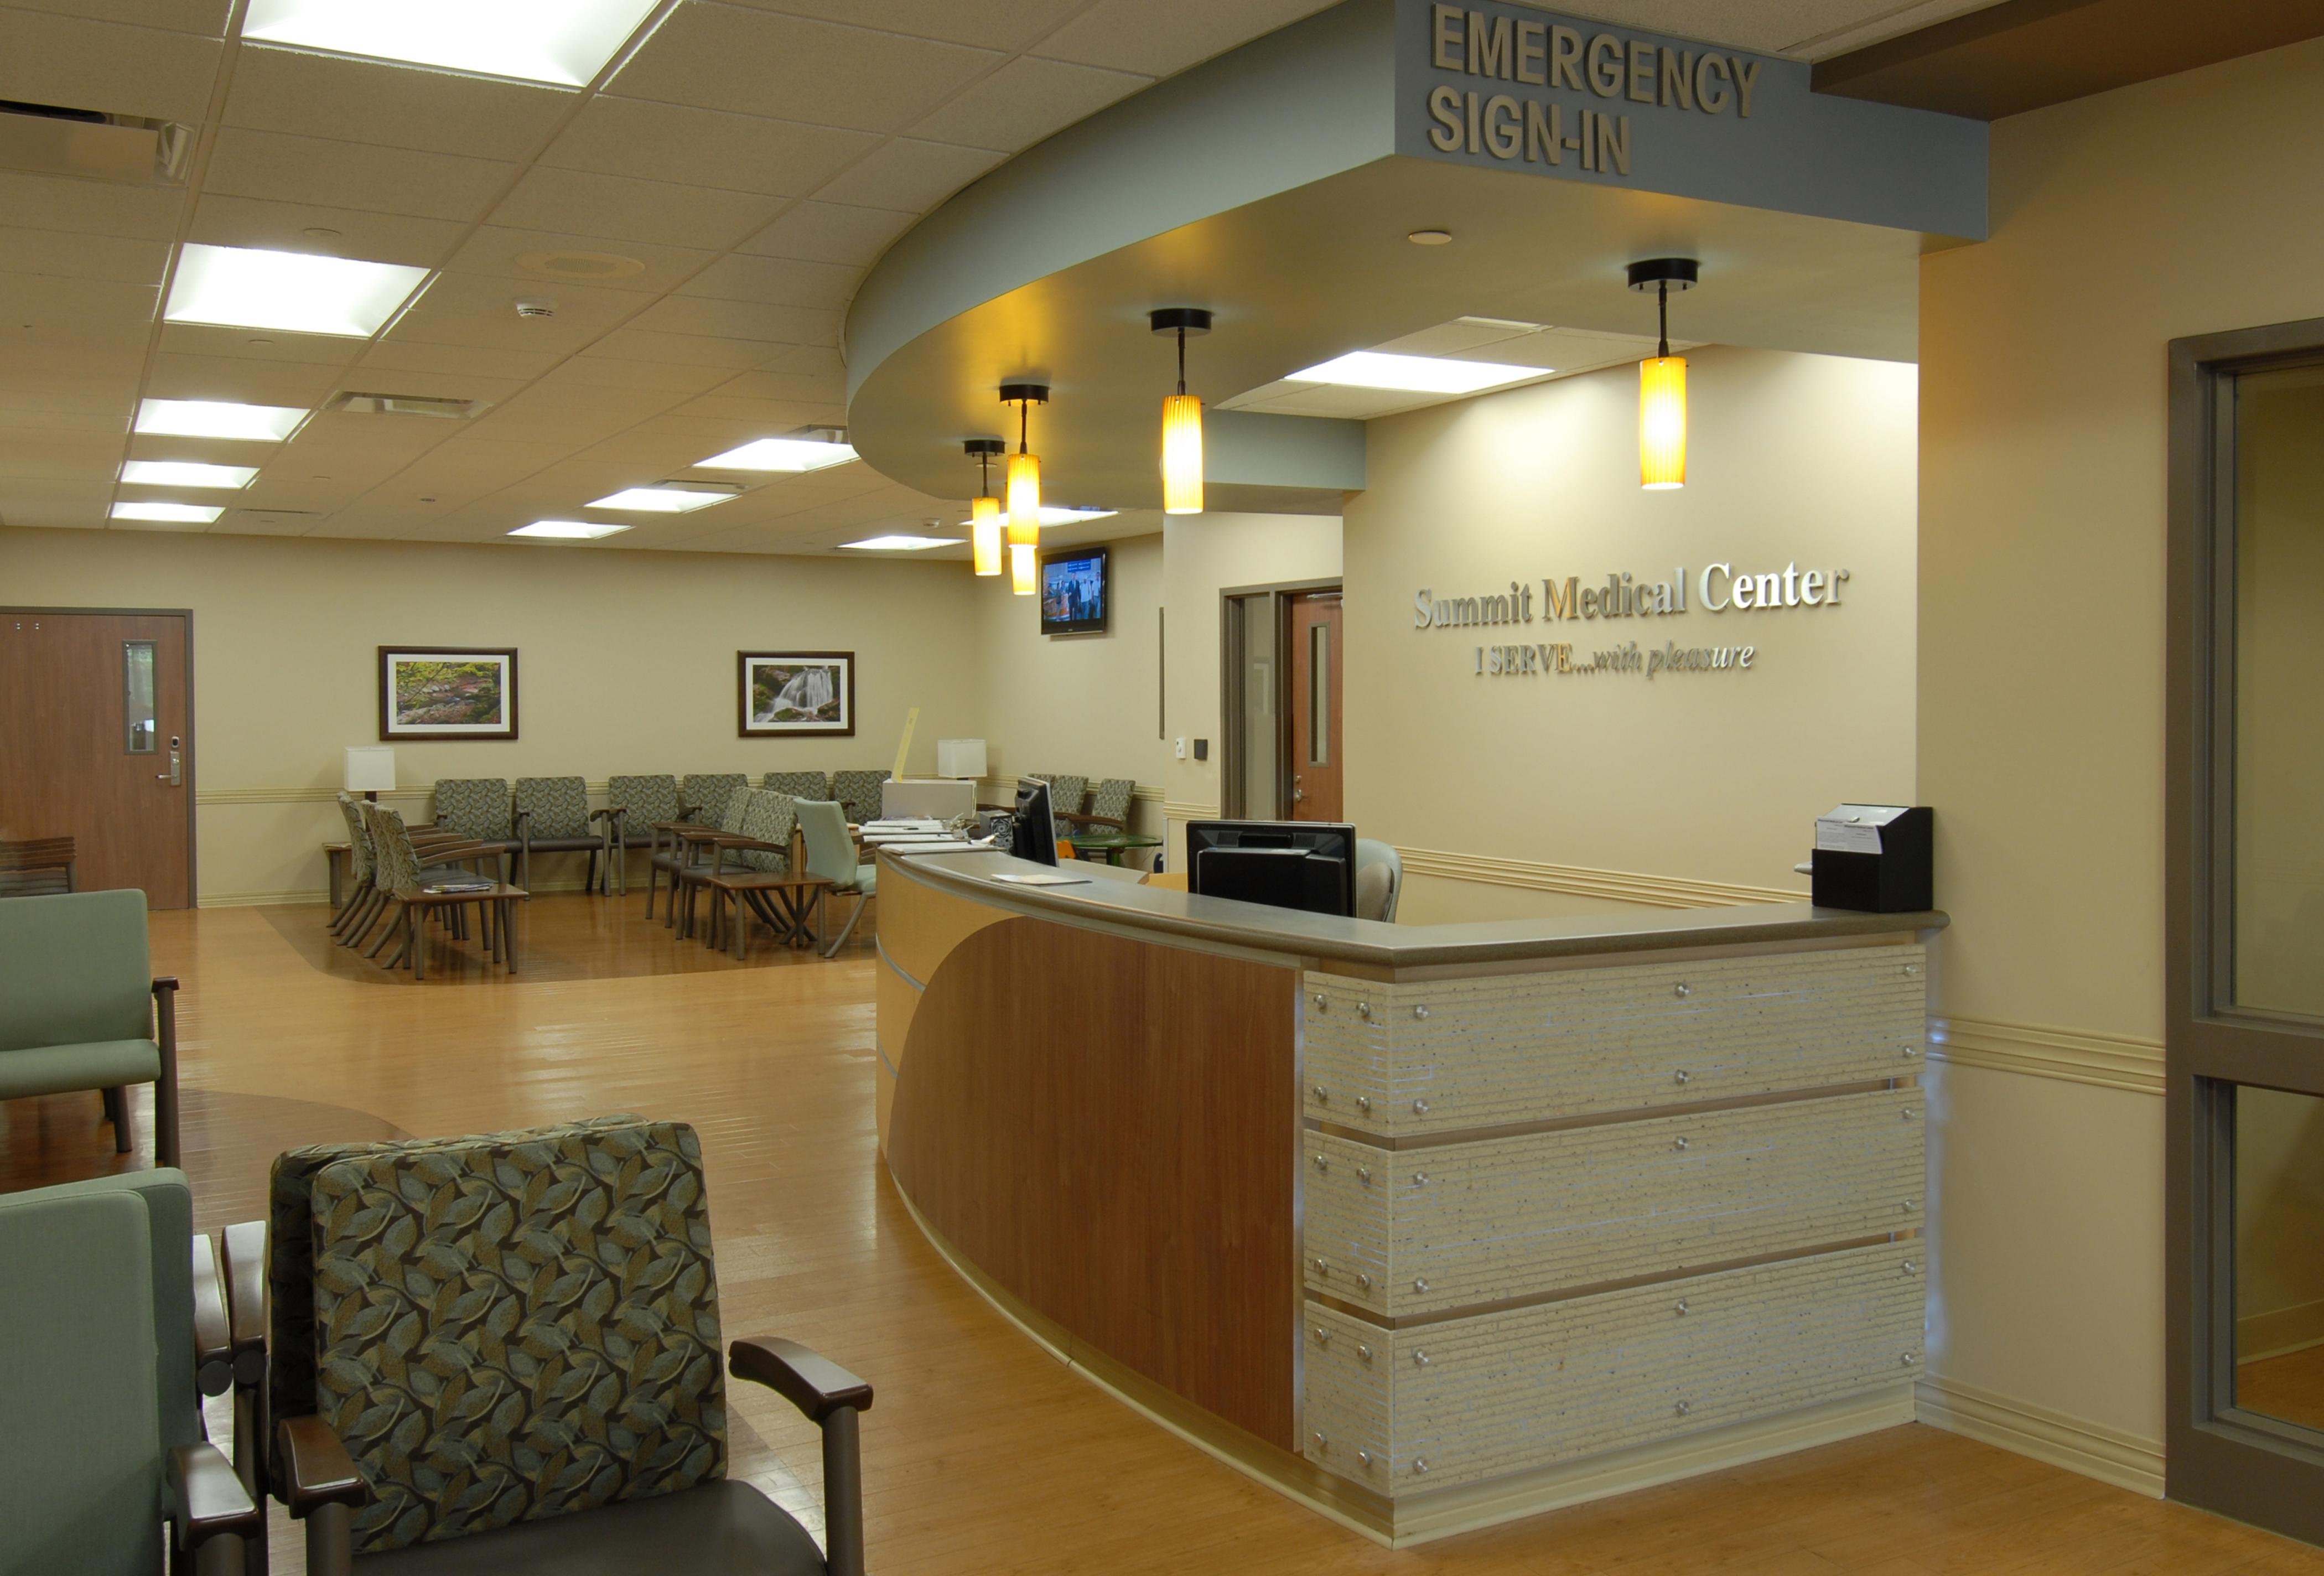 Renovation of summit medical center emergency department for Door design lab